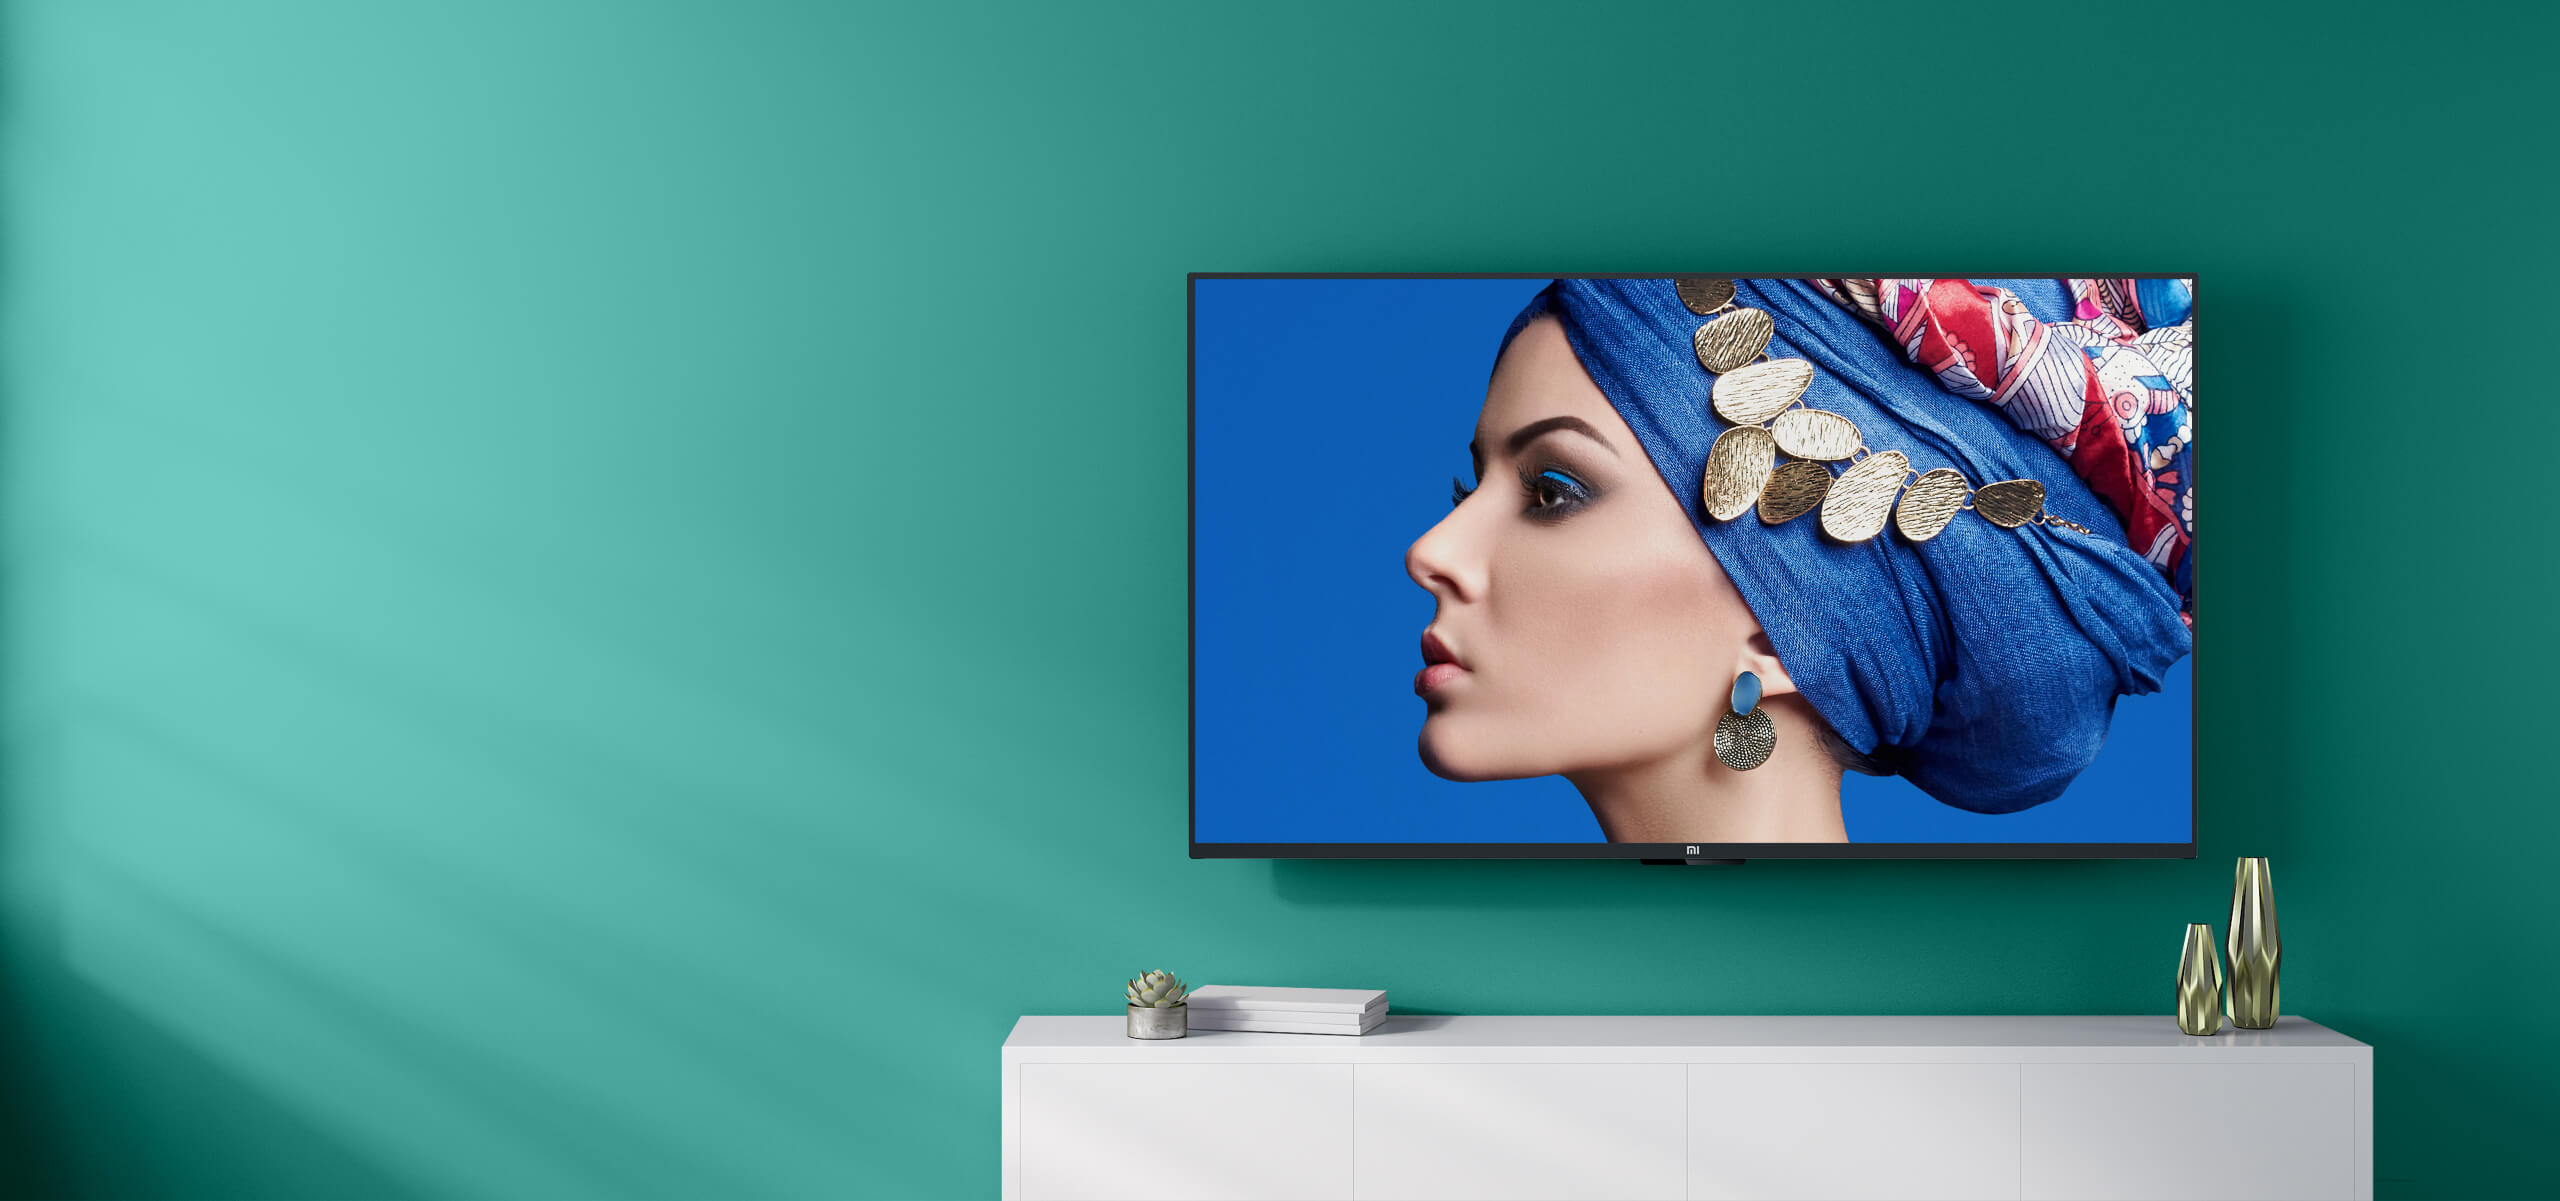 8K电视标准出炉!价格和资源成为两大拦路虎